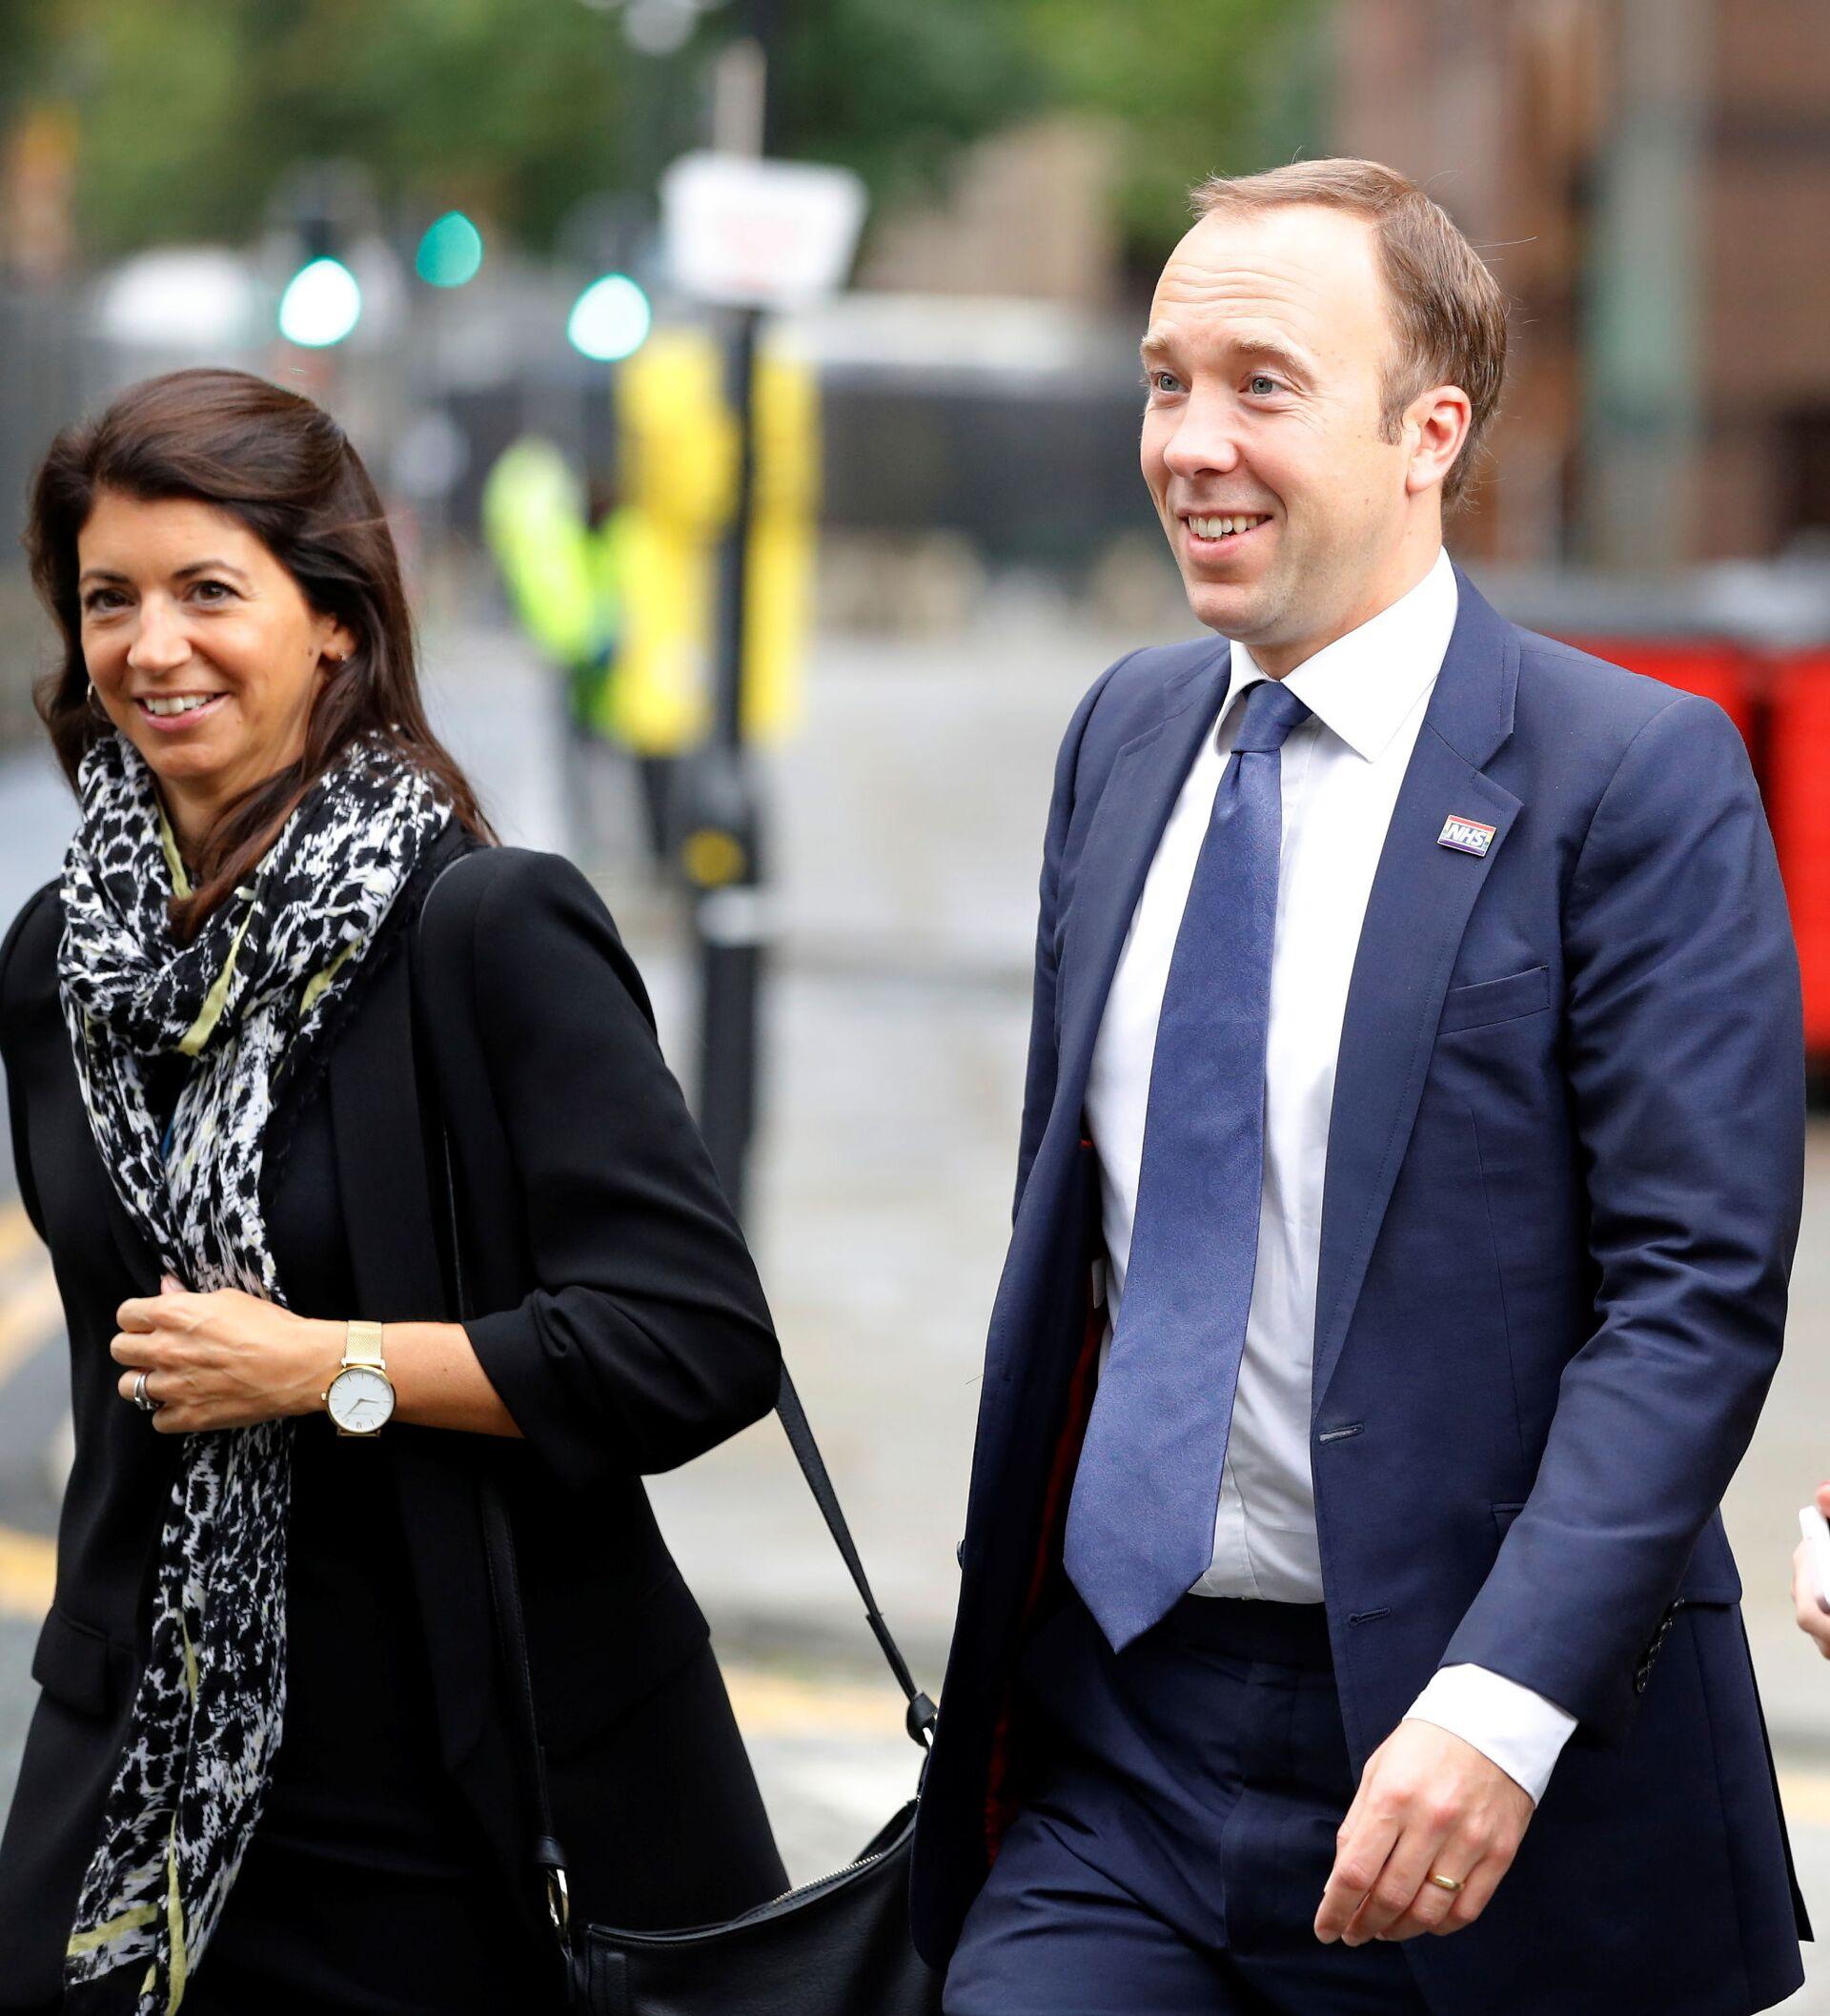 Hancock's Resignation: Did Ex-UK Health Secretary and His Aide's Affair Start in 2019? - Sputnik International, 1920, 27.06.2021